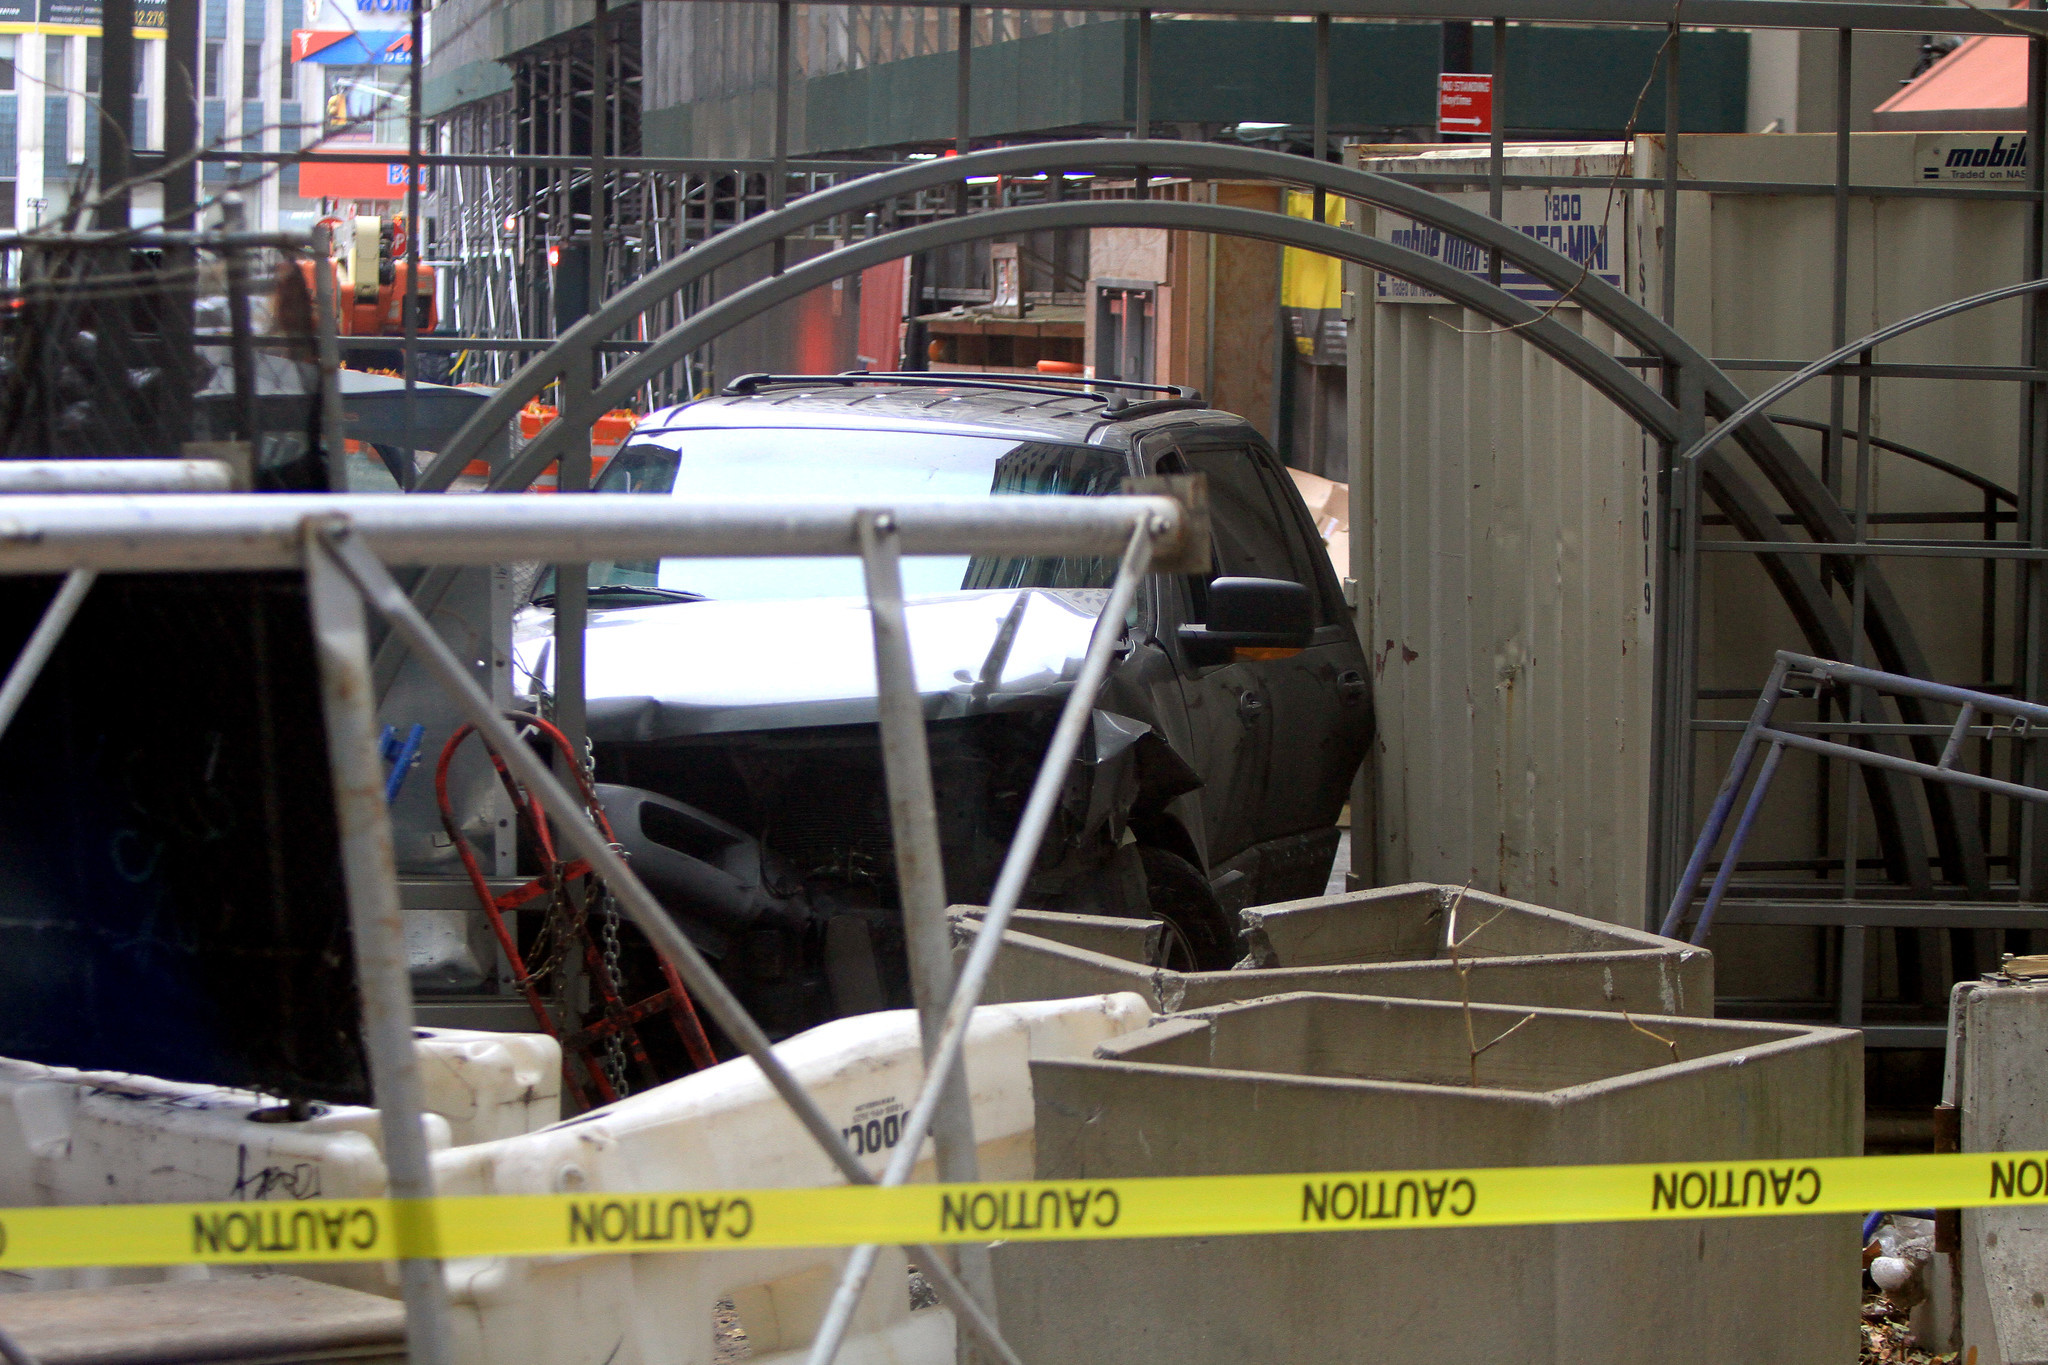 Woman, 40, fatally struck crossing street in NYC